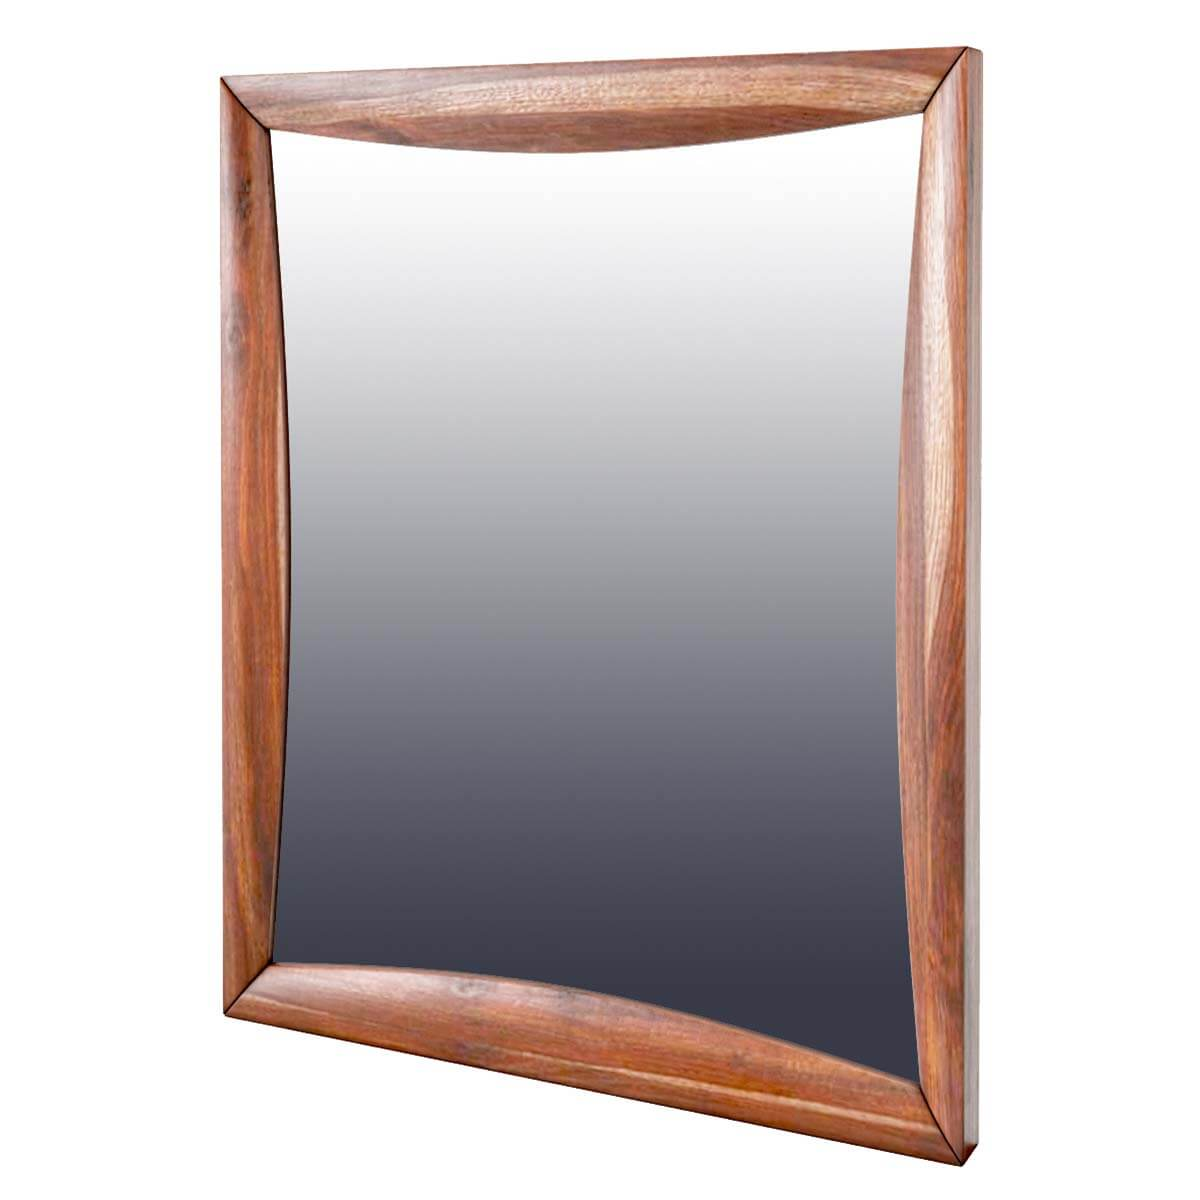 modern pioneer solid wood dresser mirror frame